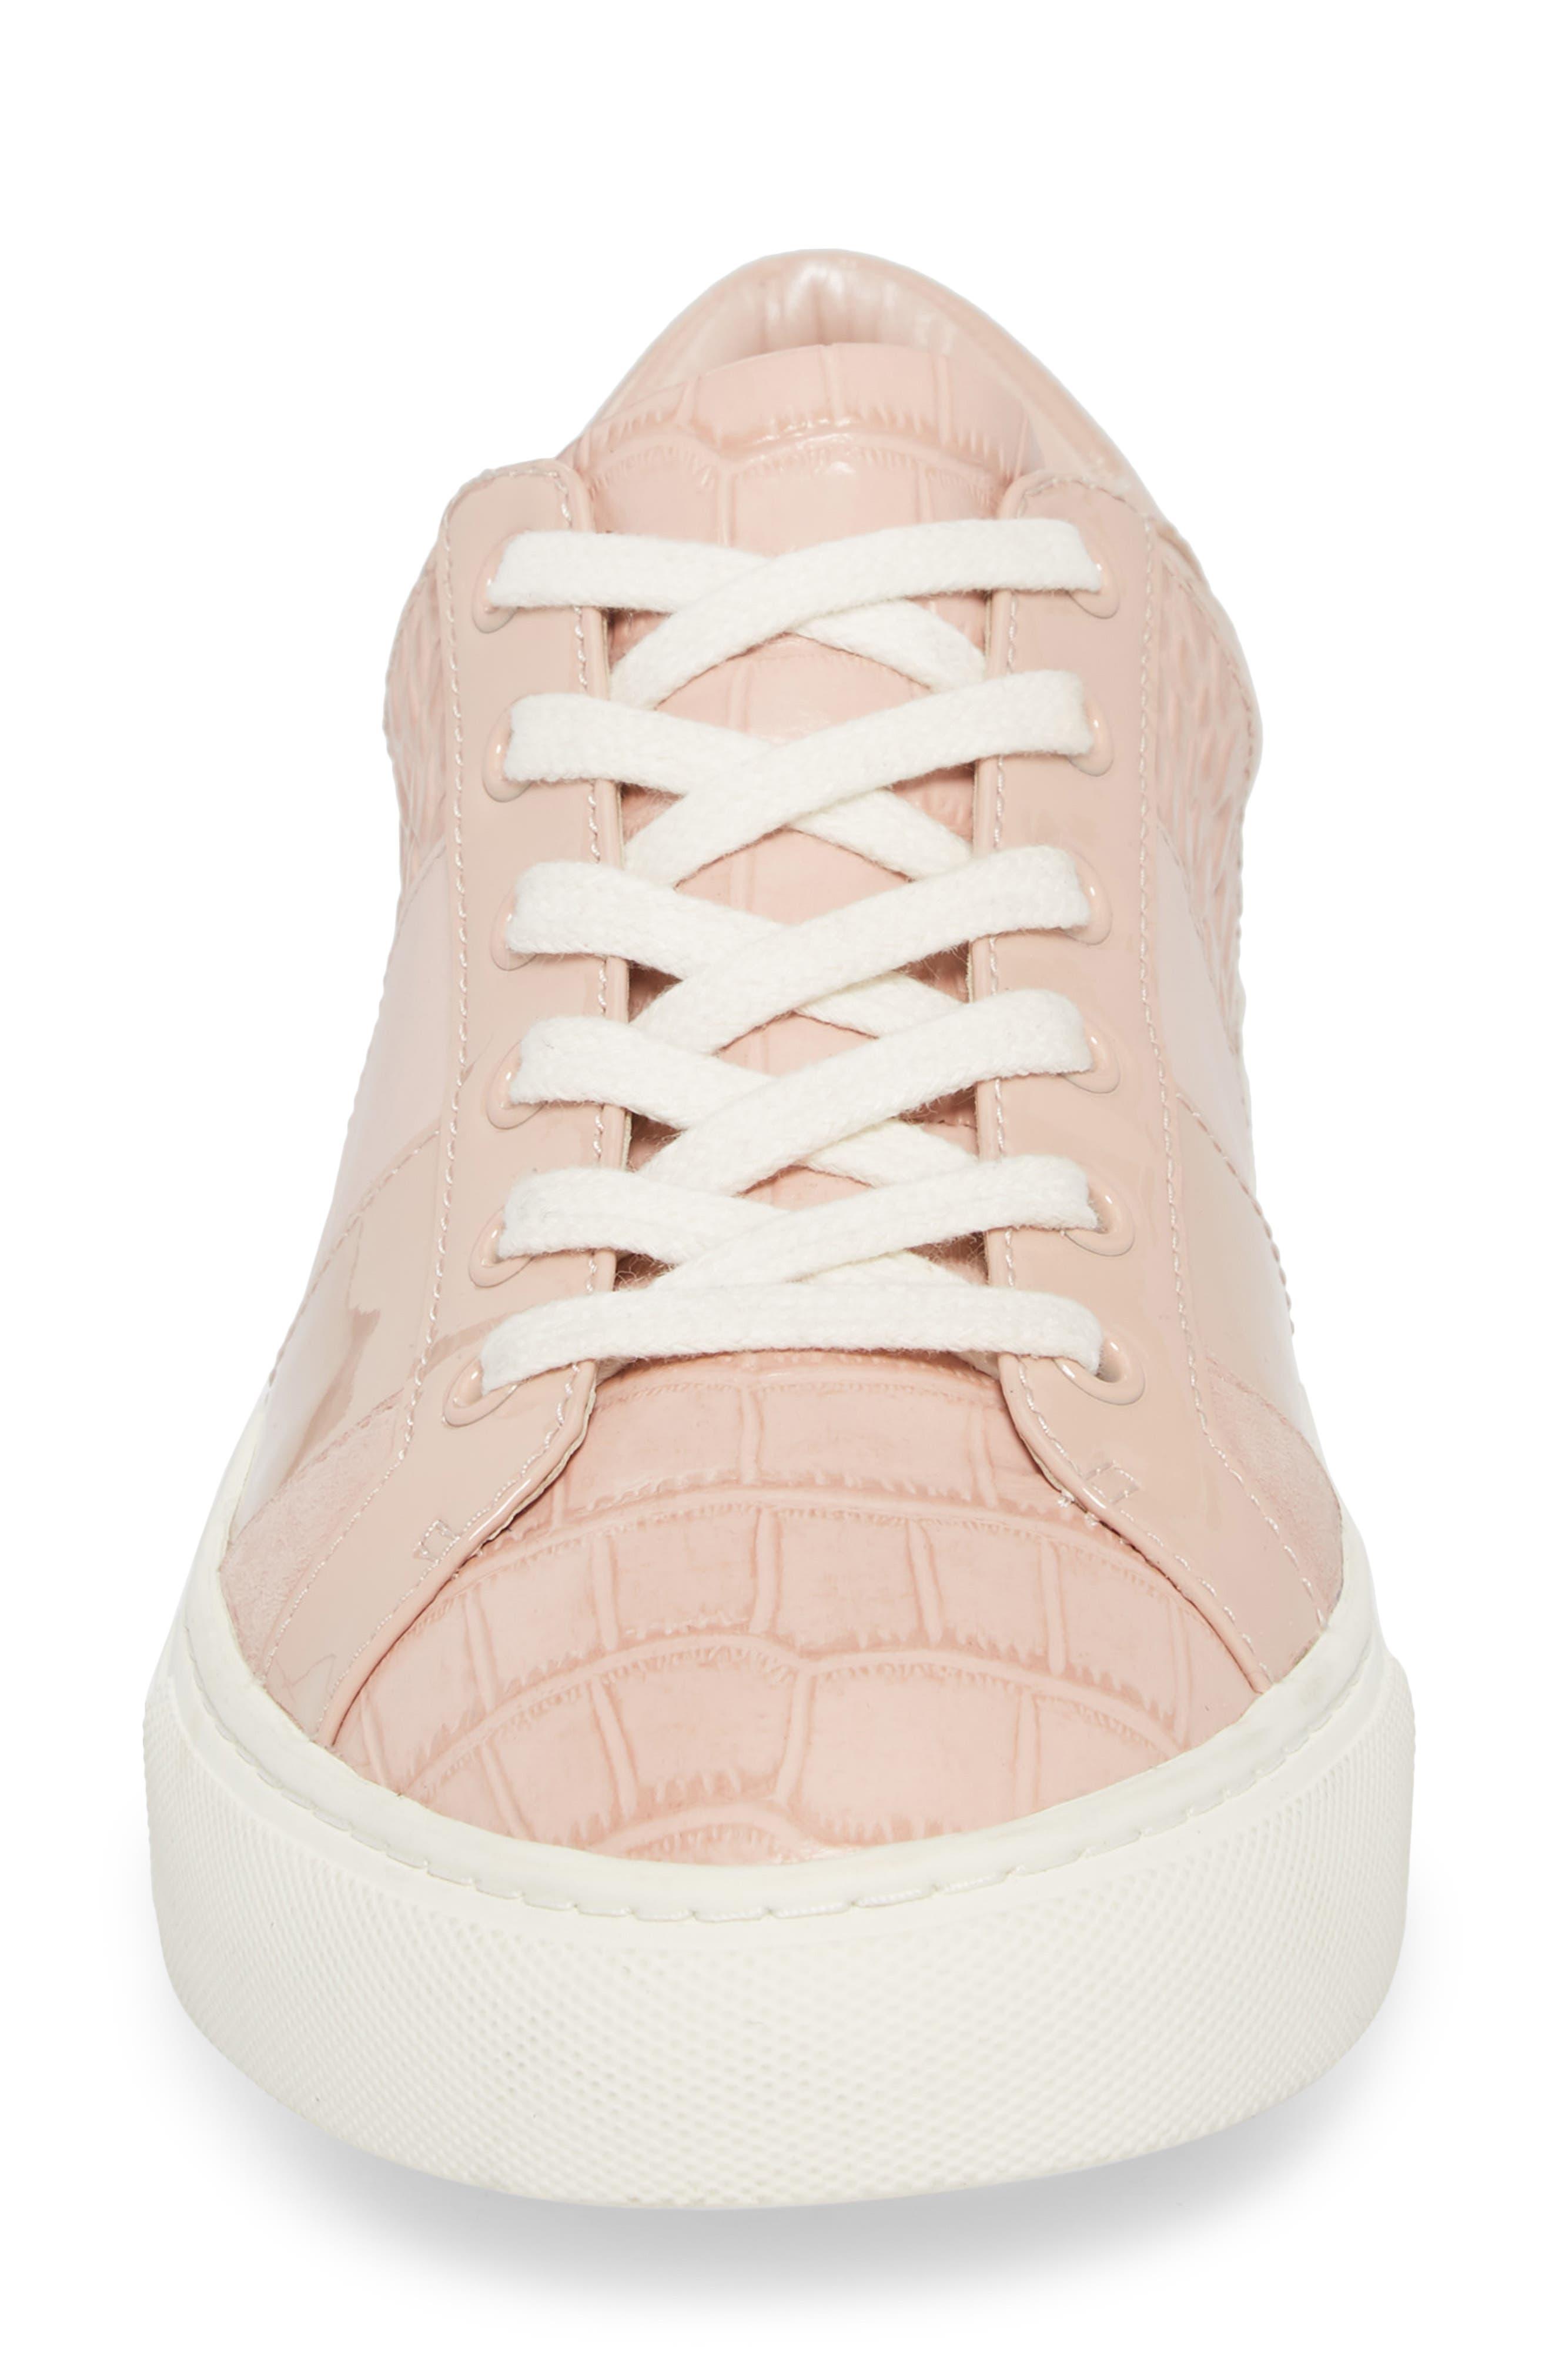 Ames Sneaker,                             Alternate thumbnail 4, color,                             Sea Shell Pink/ Sea Shell Pink